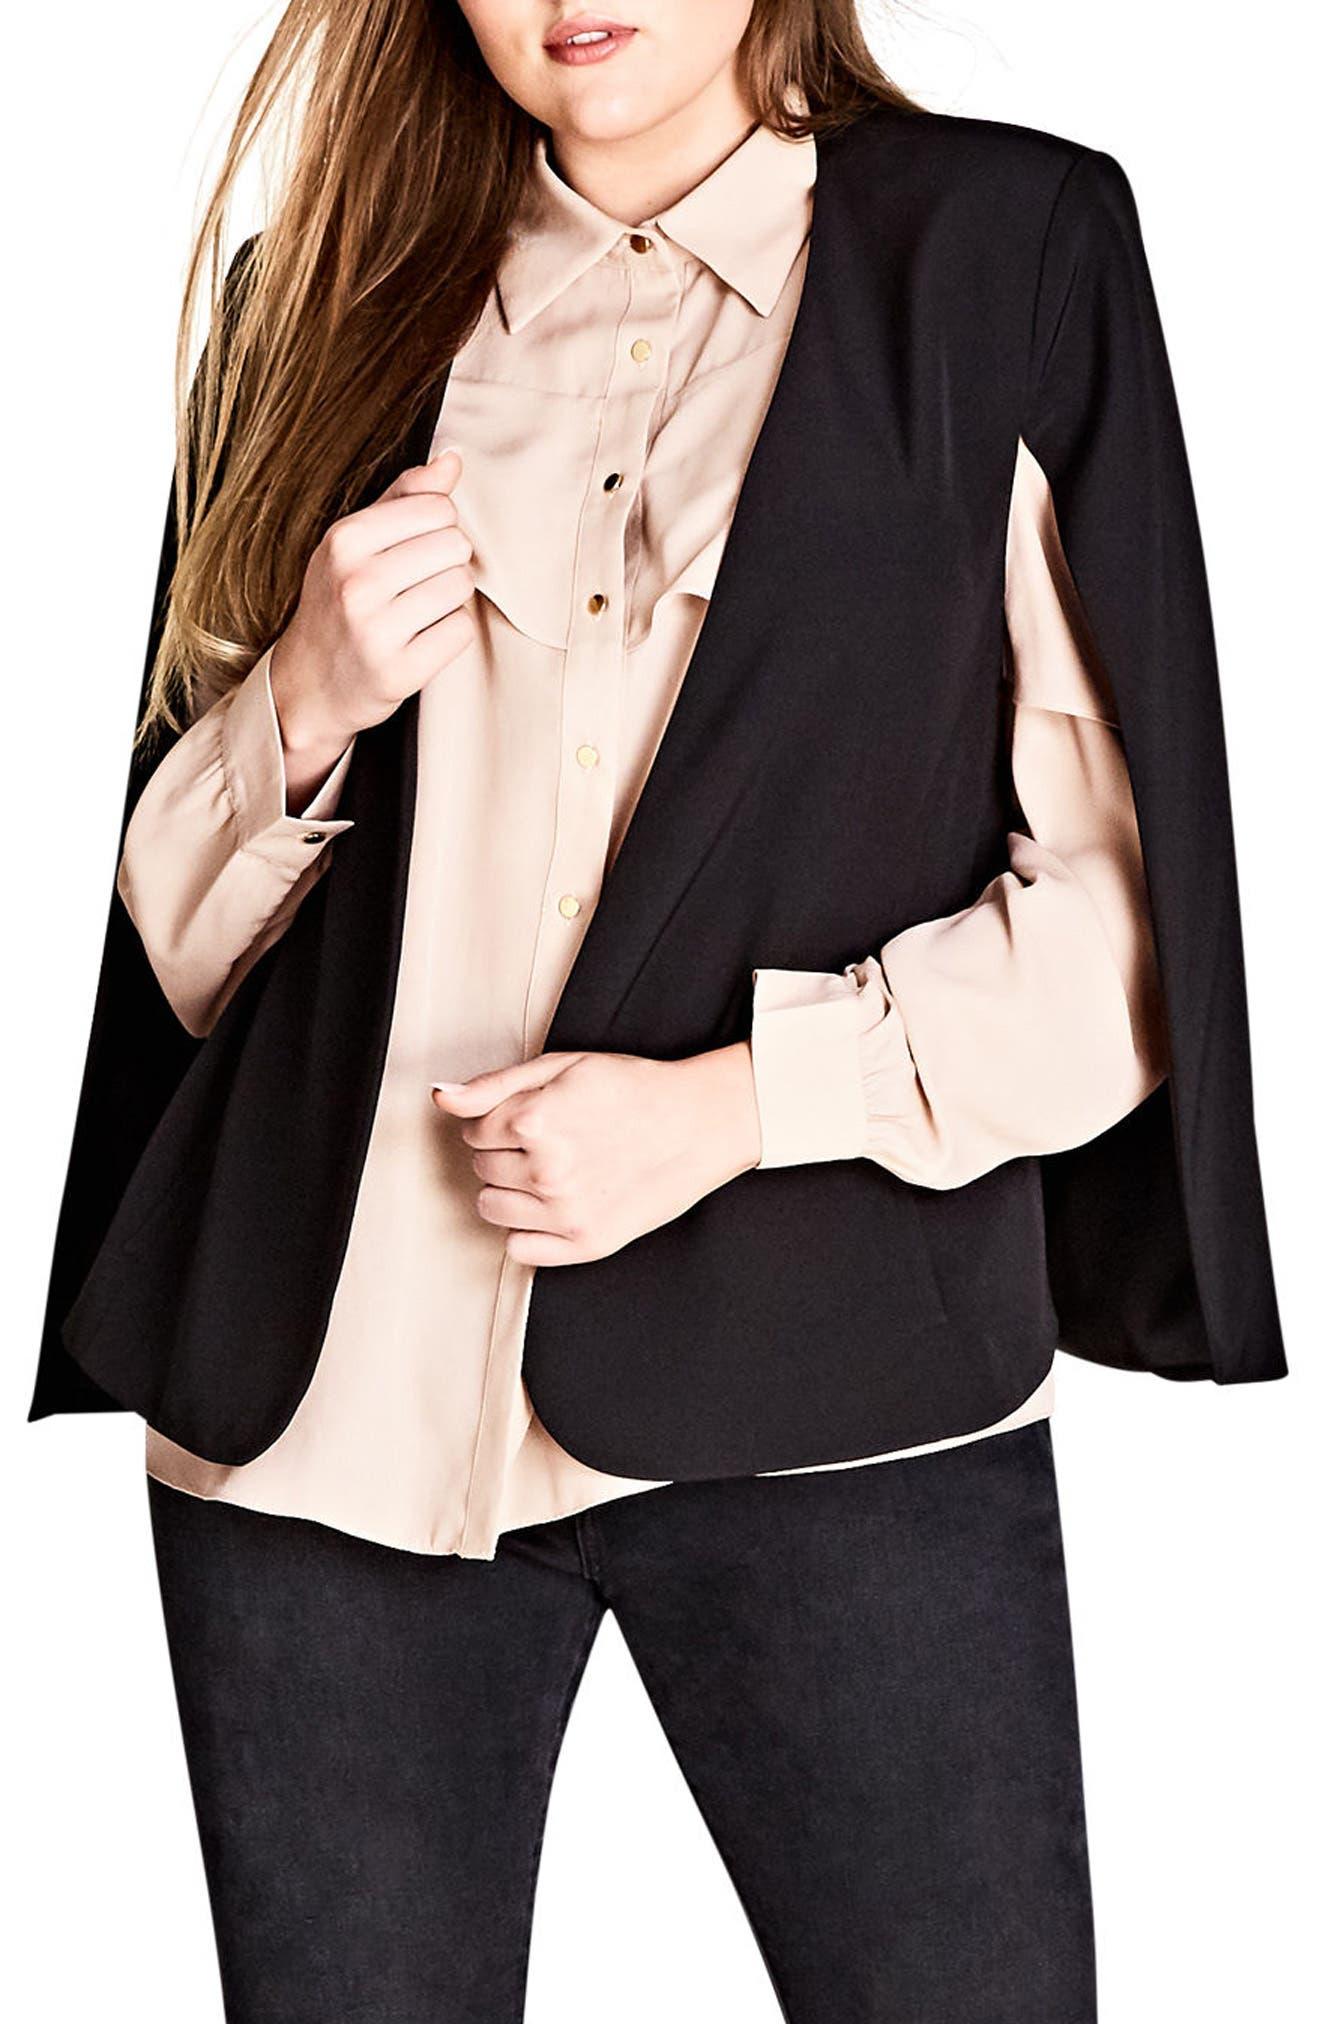 Alternate Image 1 Selected - City Chic Jacket Sharp Cape (Plus Size)